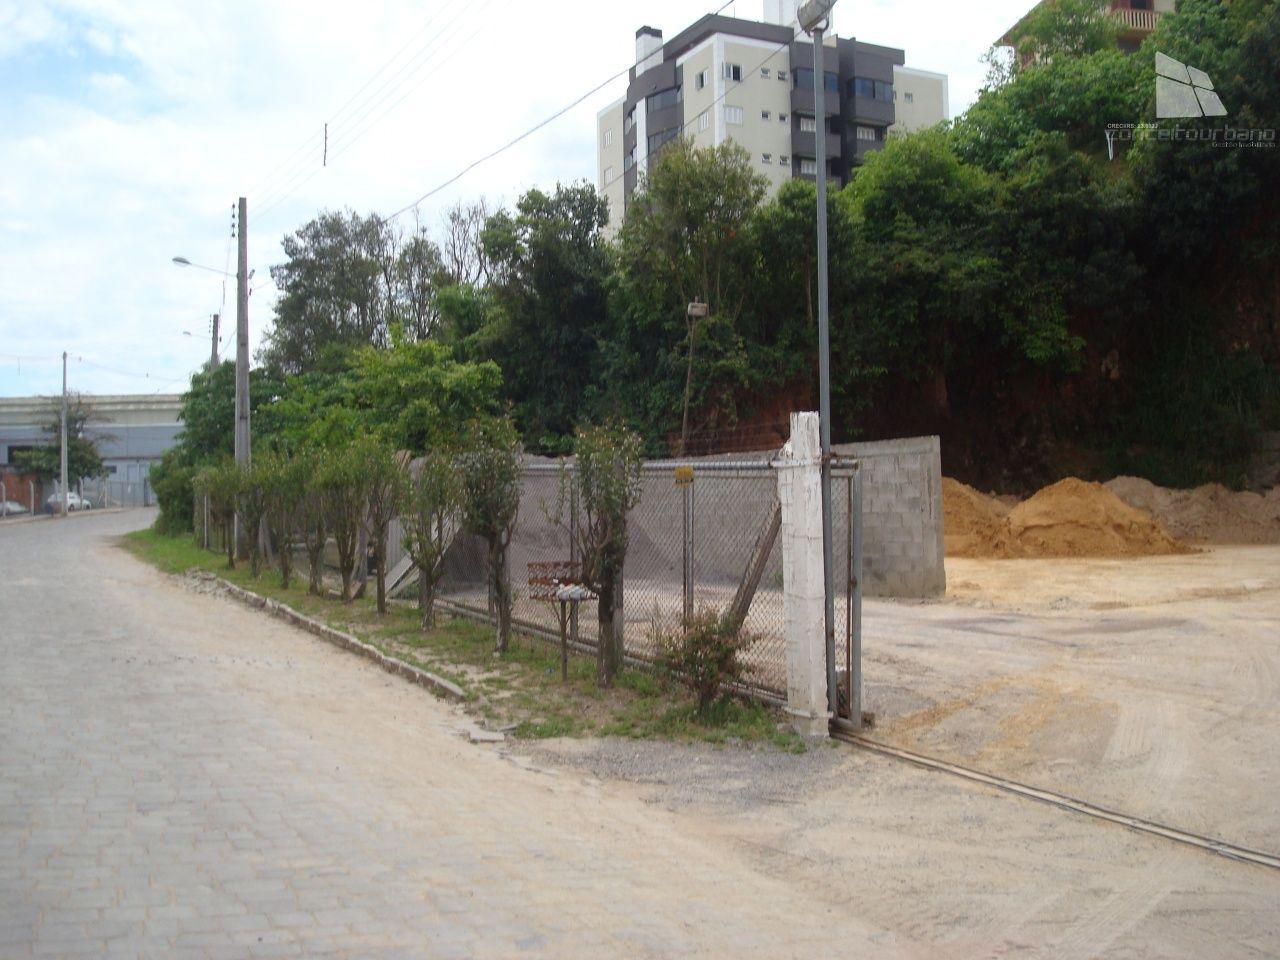 Terreno/Lote à venda  no Pomarosa - Bento Gonçalves, RS. Imóveis